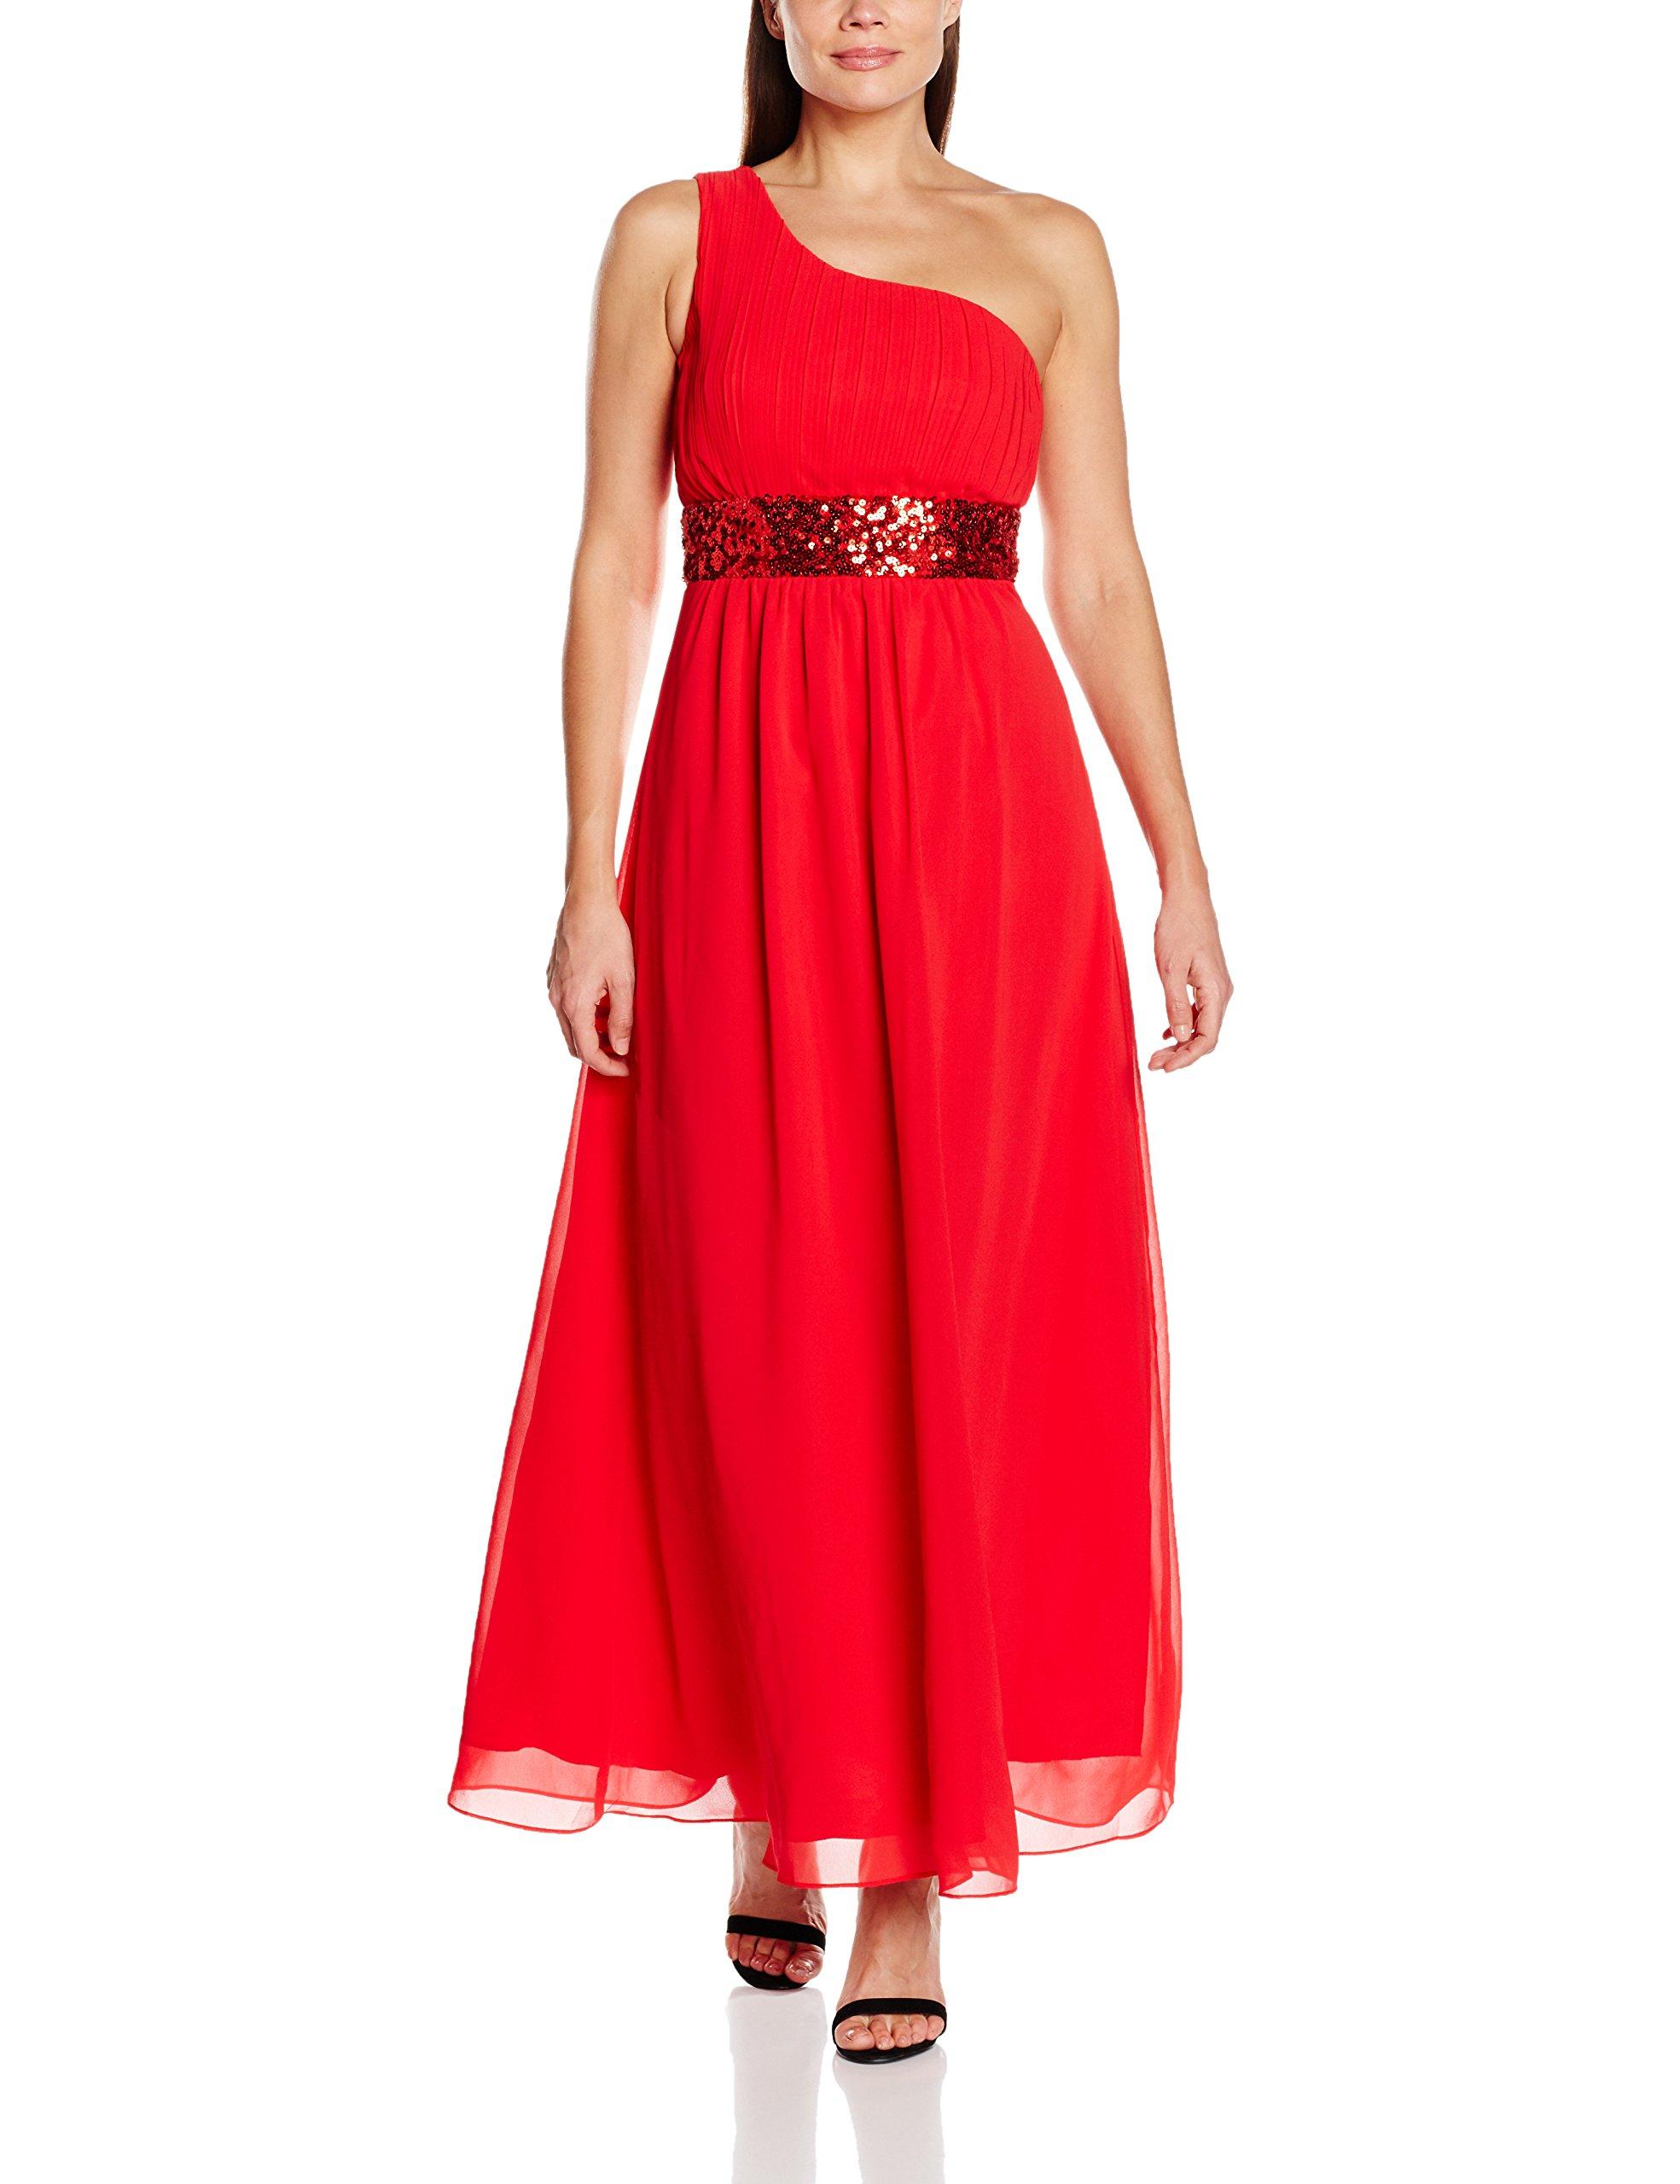 Evening Dress My Fête 36Femme De Ahtaille Robes soiréered Grace Du Fabricant YbgyfI6v7m